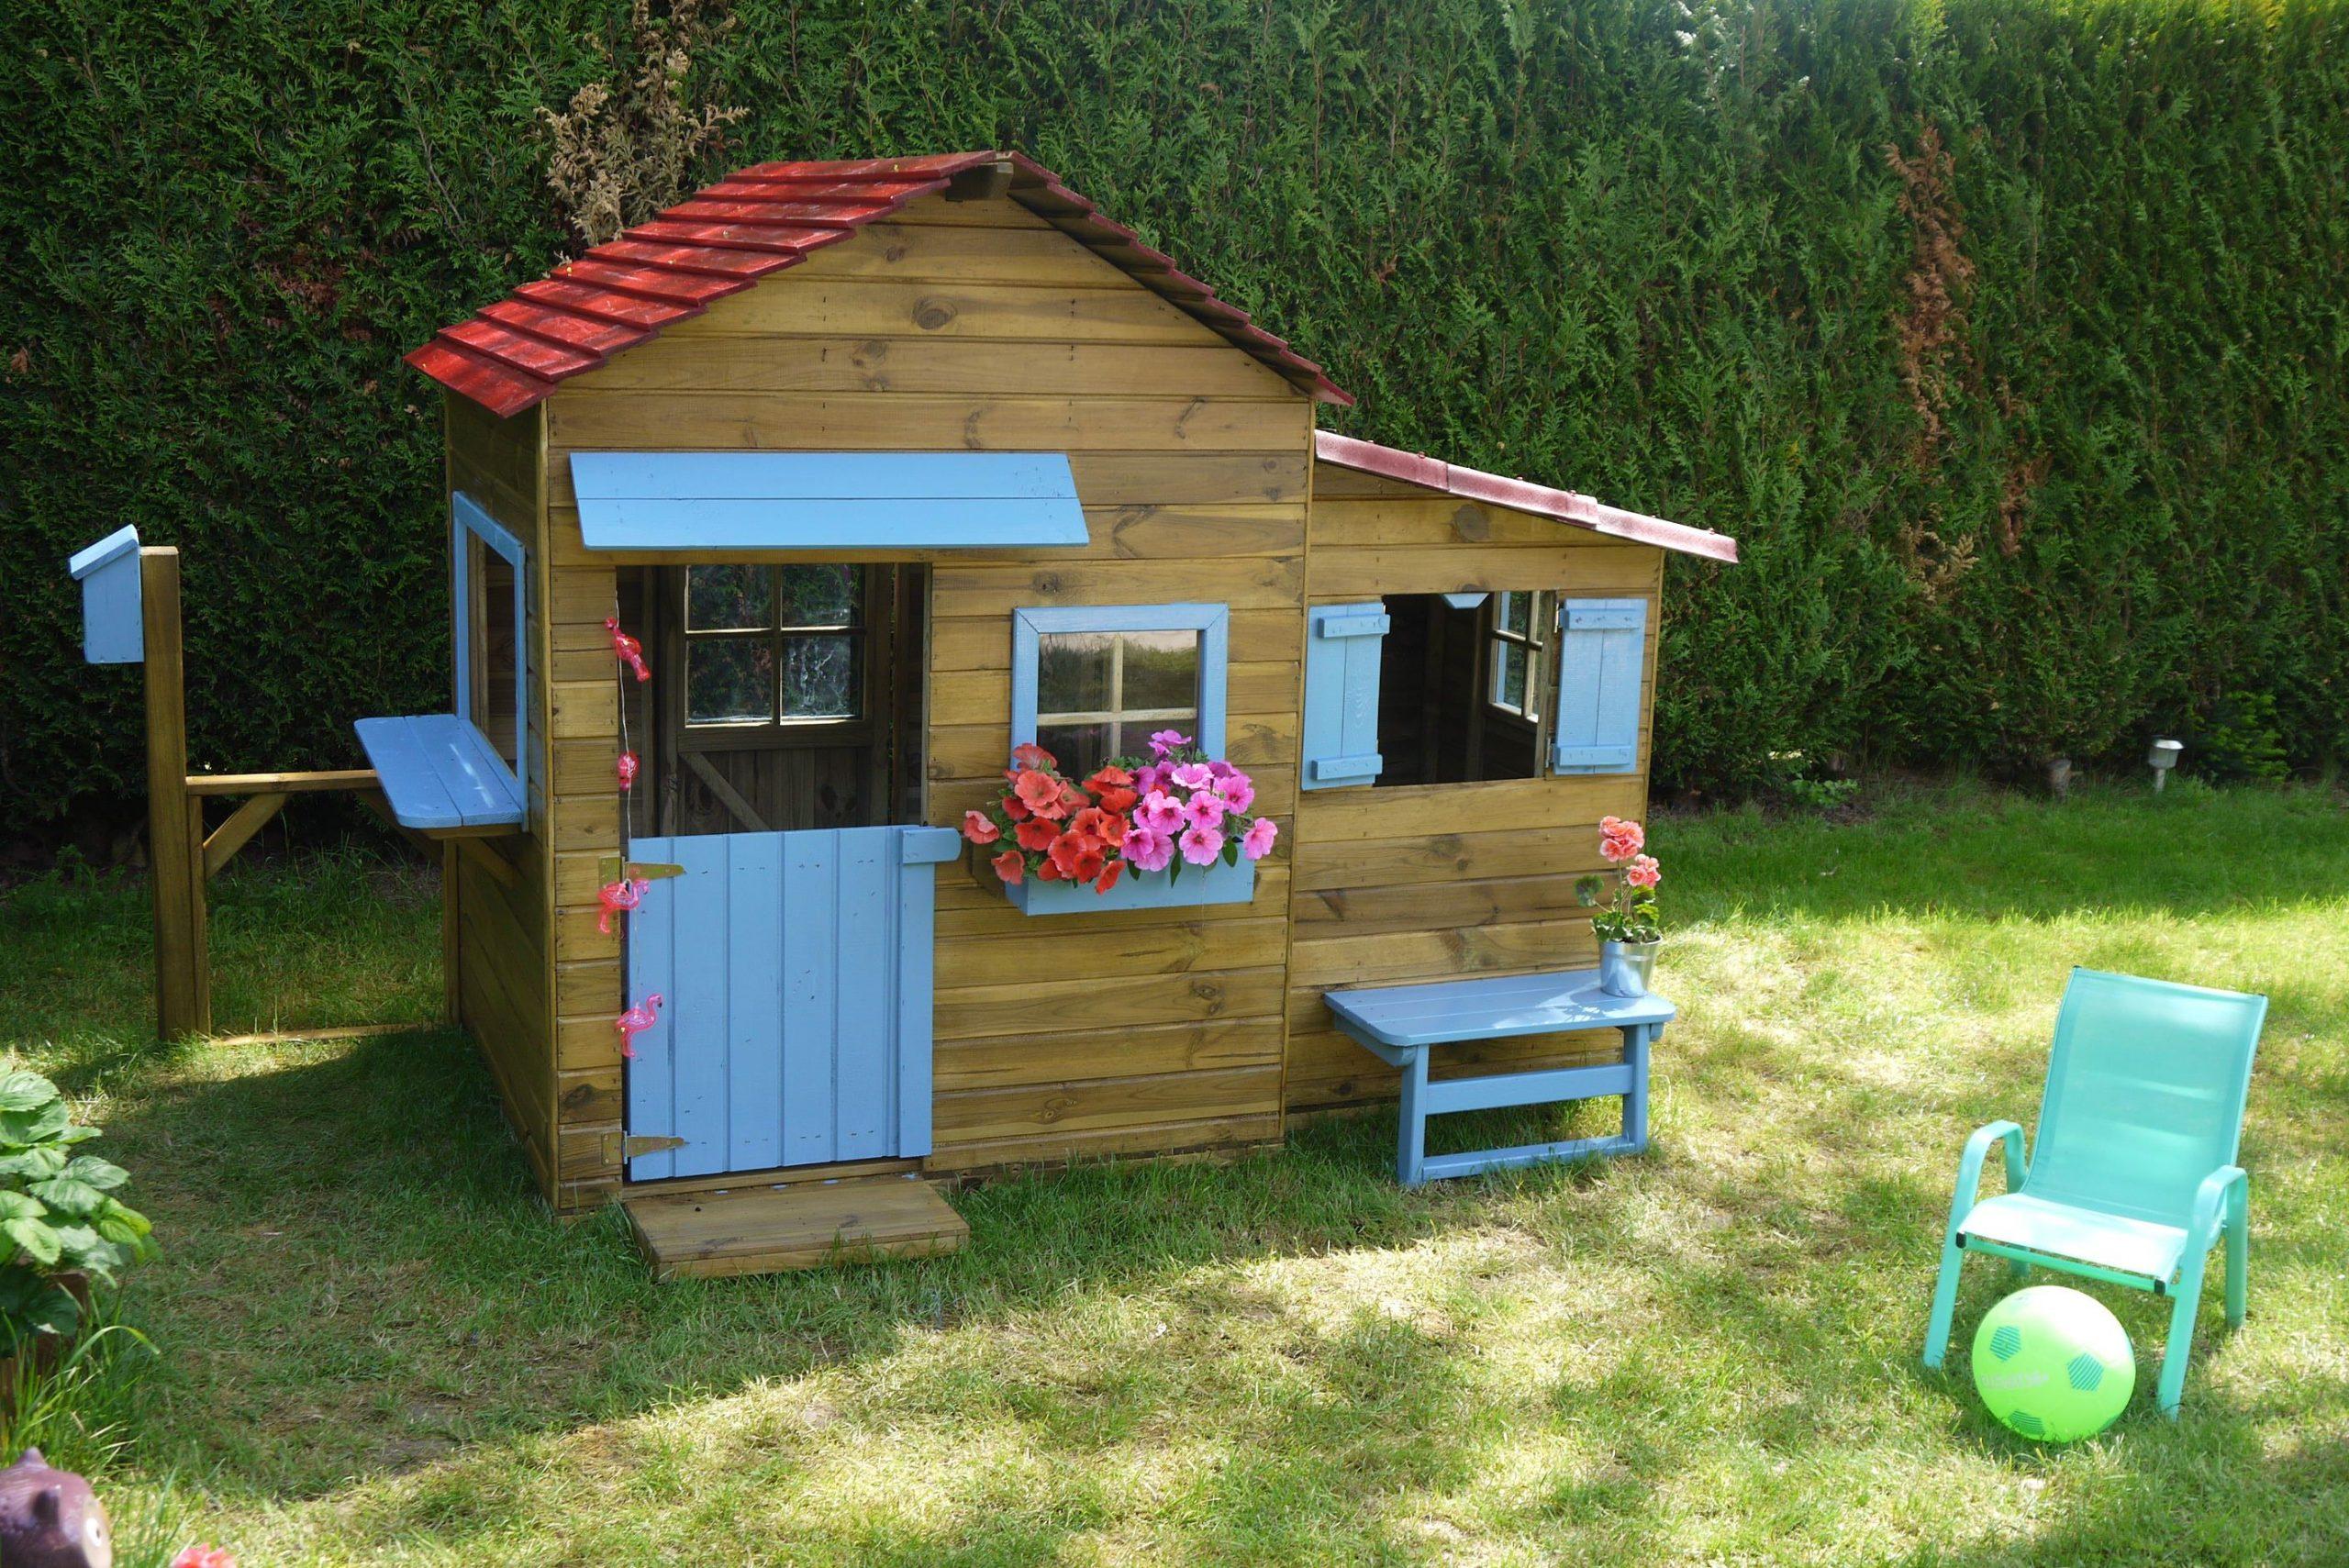 Maisonnette En Bois Family   Maisonnette En Bois ... concernant Cabanne Jardin Enfant